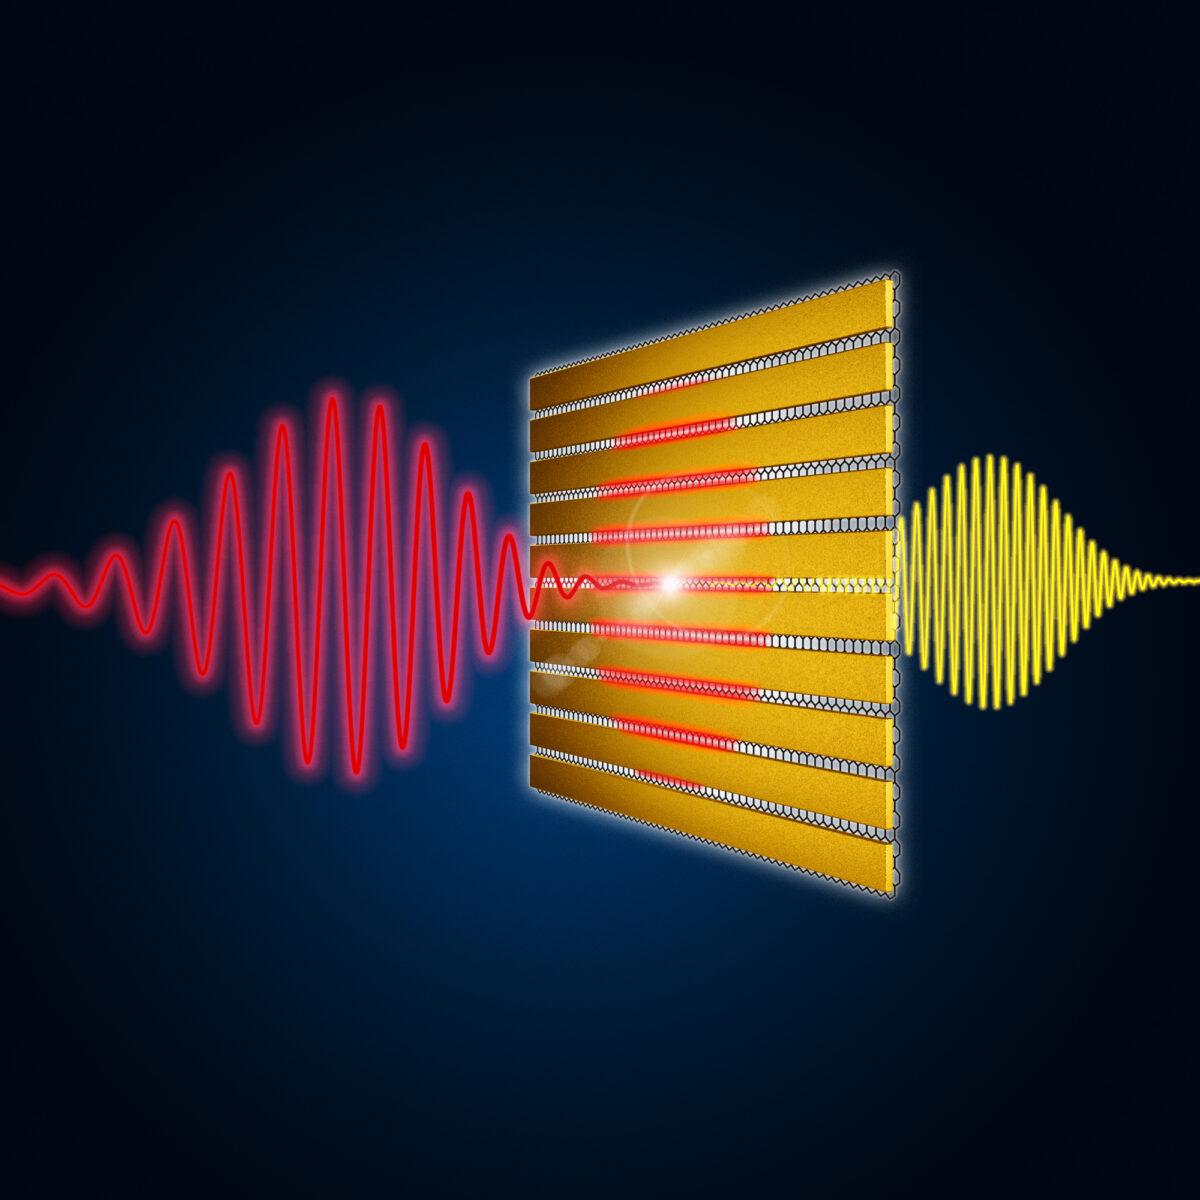 Grating-graphene metamaterial for THz nonlinear photonics